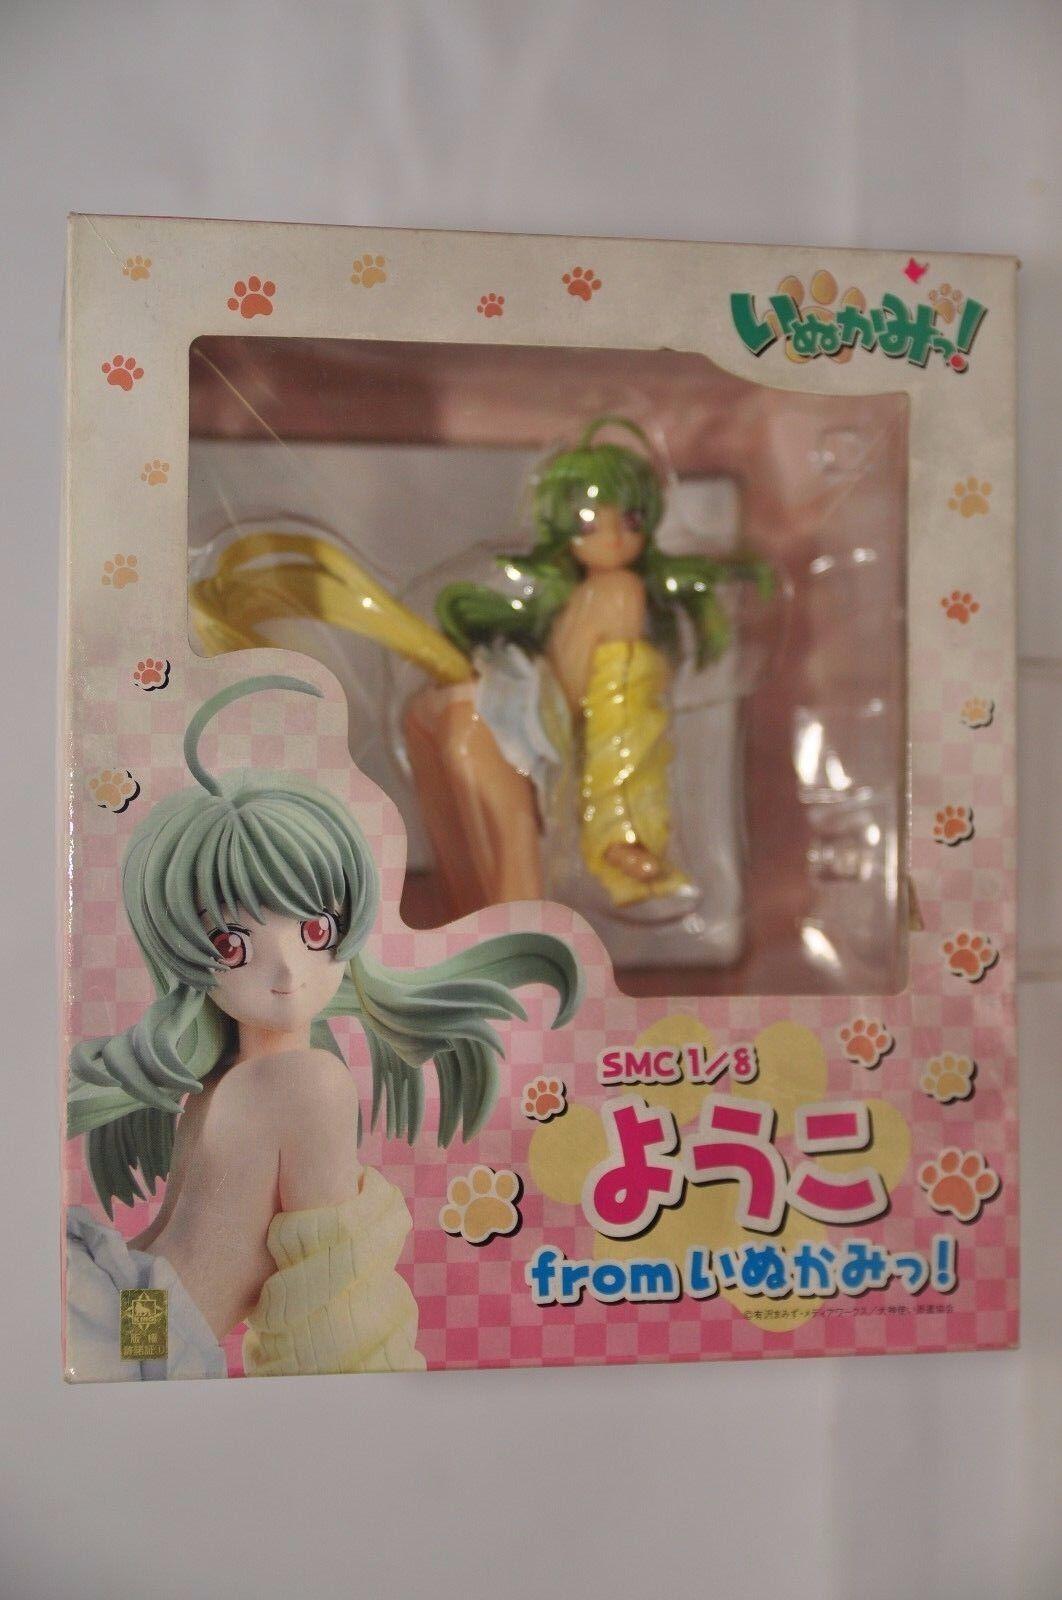 Happinet Japan Inukami Yoko SMC 1 8 Scale PVC Statue 4907953803992 NEW Genuine